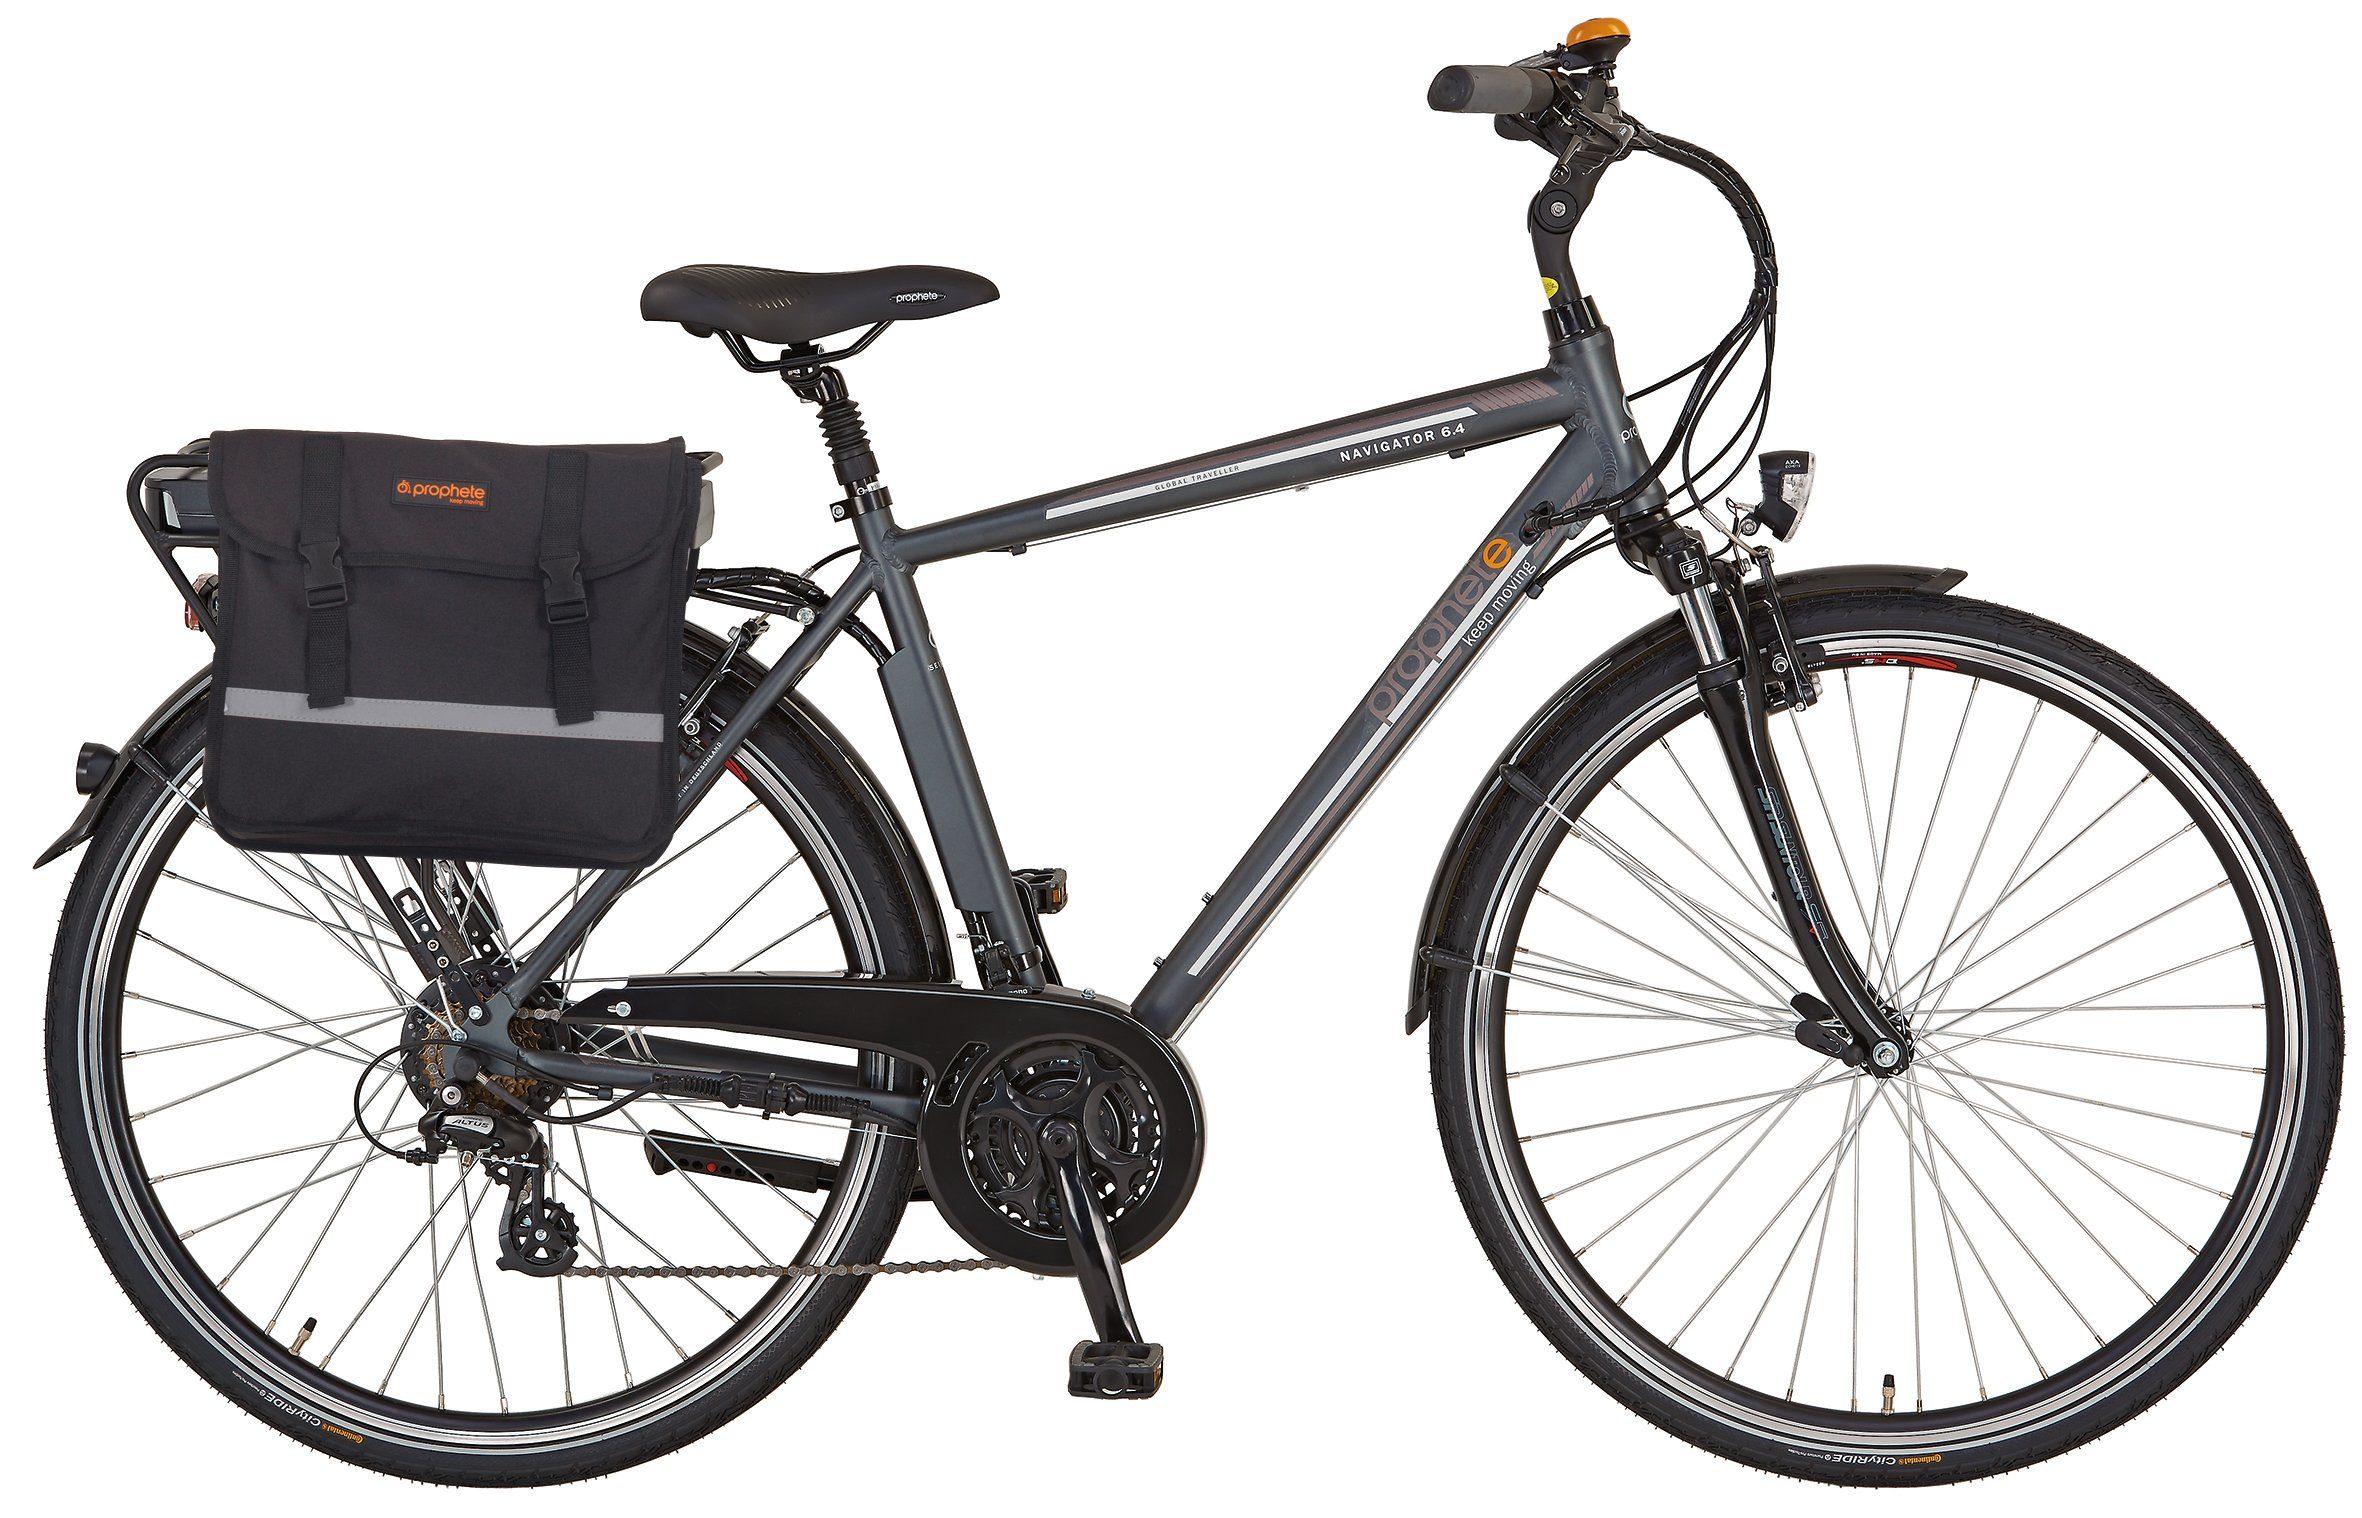 Prophete He. Trekking E-Bike, 36V/250 W HR-Motor, 28 Zoll, 24 G. Shimano Kettensch., »Navigator 6.4« mit Doppelpacktasche